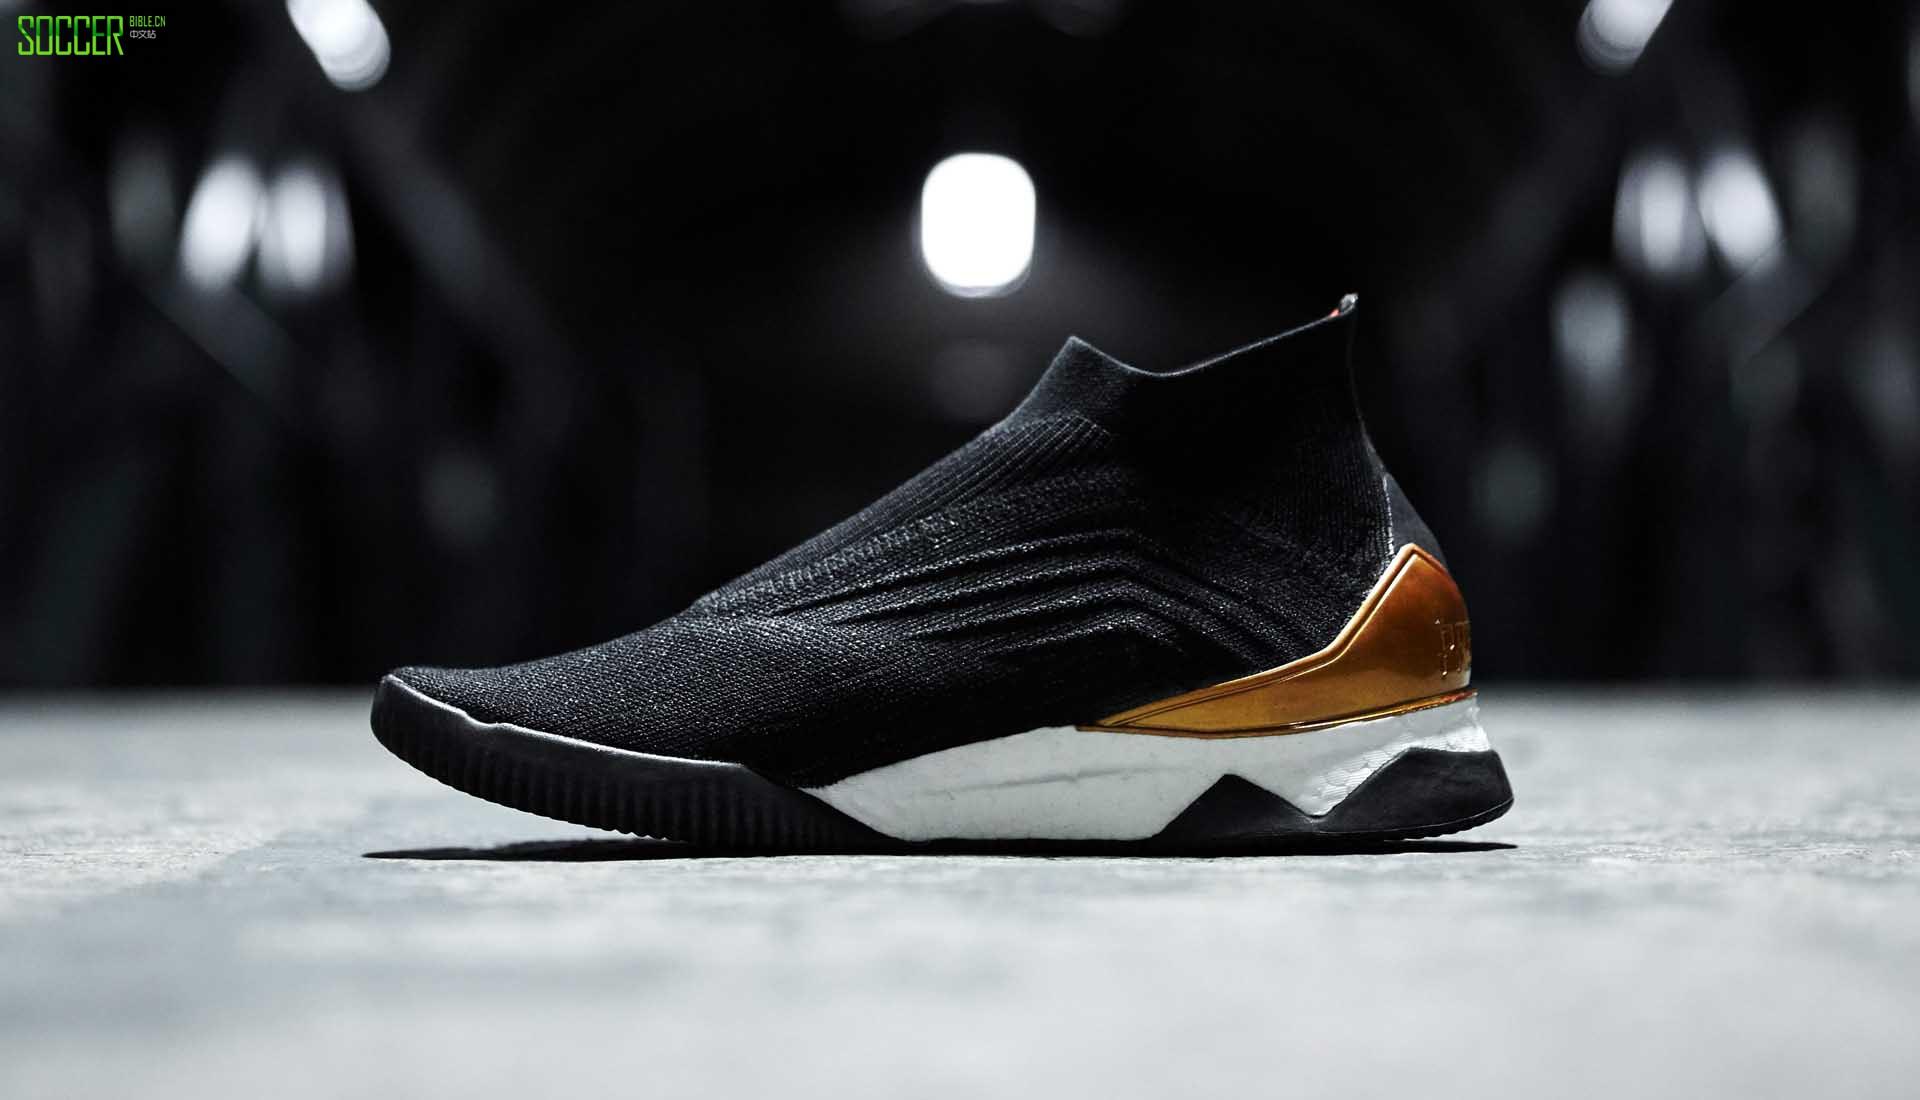 6-adidas-predator-18-tango-ultraboost-min